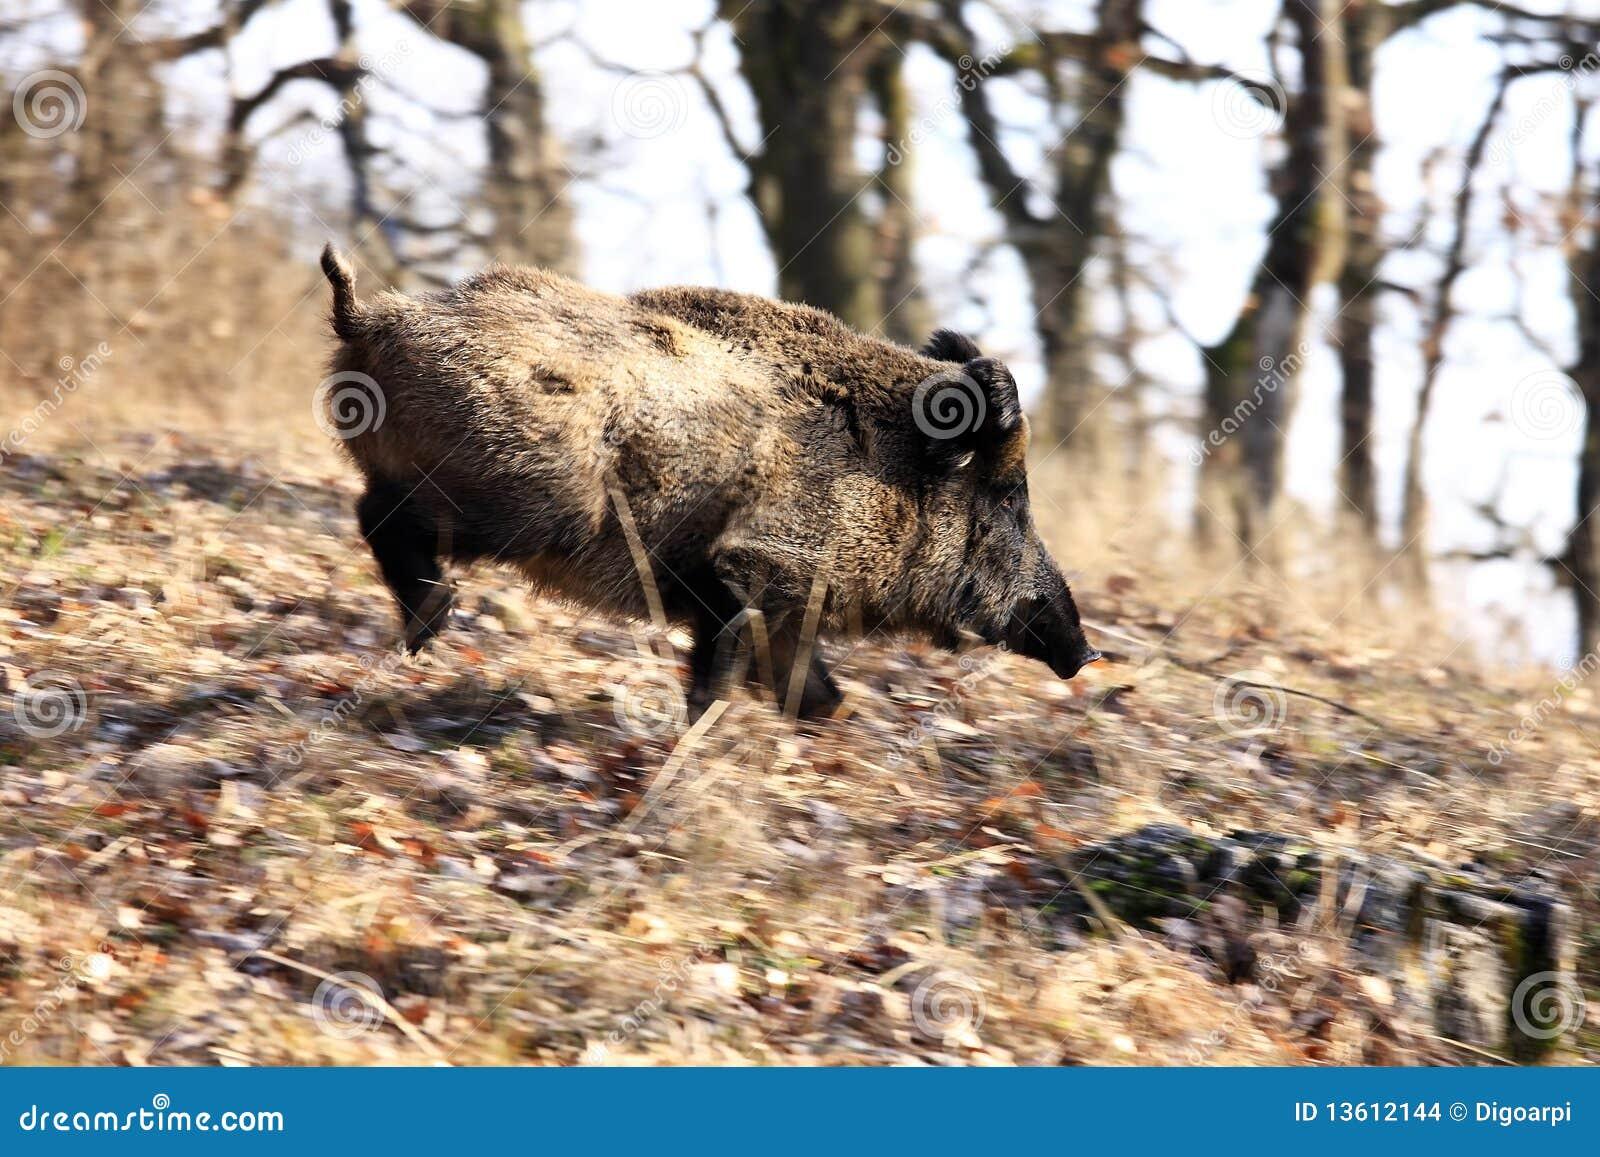 A big wild boar stock photo. Image of animal, wildlife ... Giant Wild Boar Photos